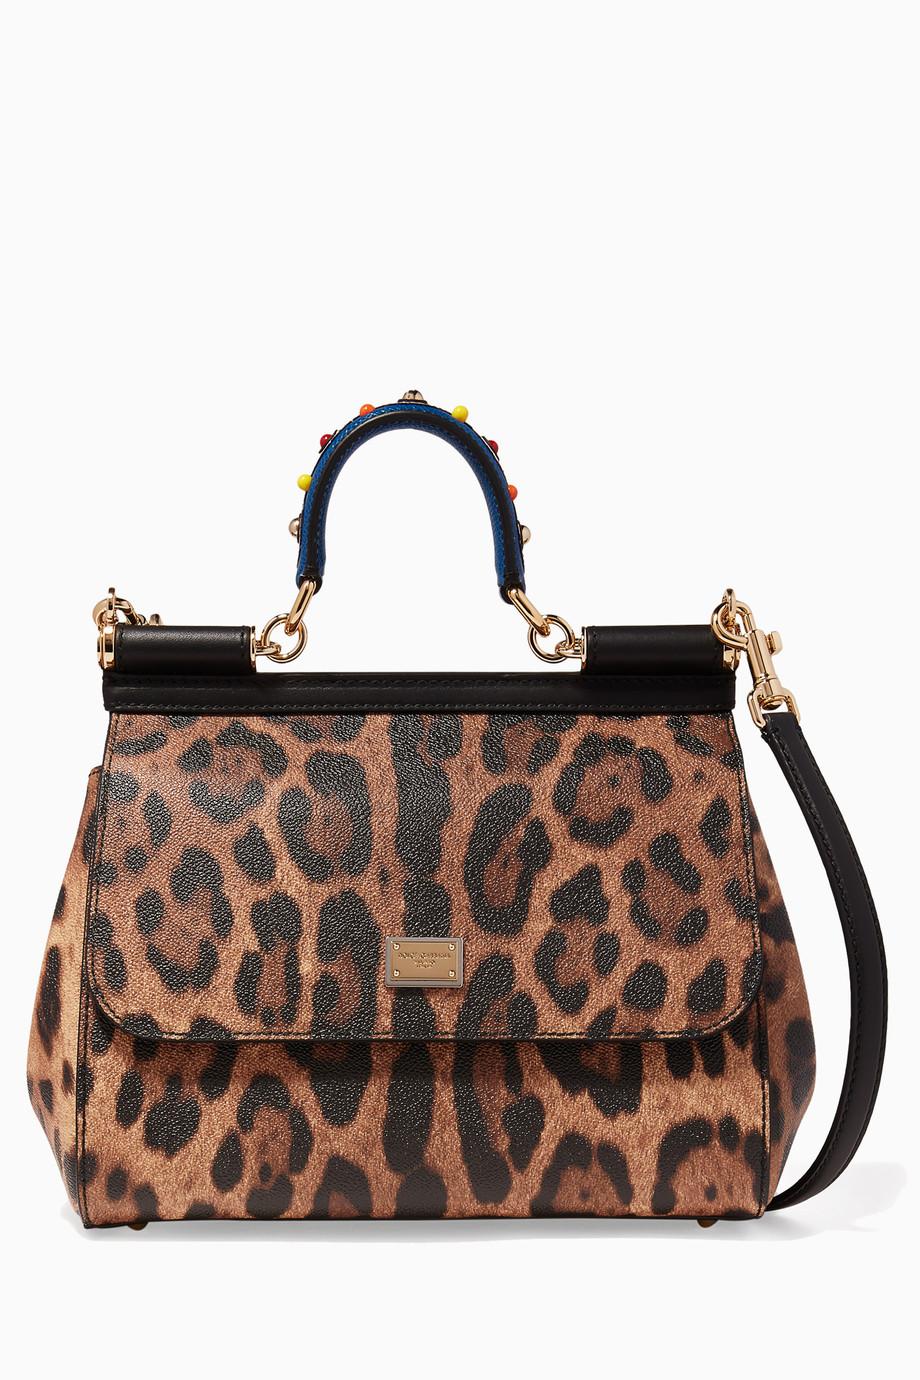 278341b37eff Shop Dolce   Gabbana Brown Leopard Print Medium Sicily Top Handle ...